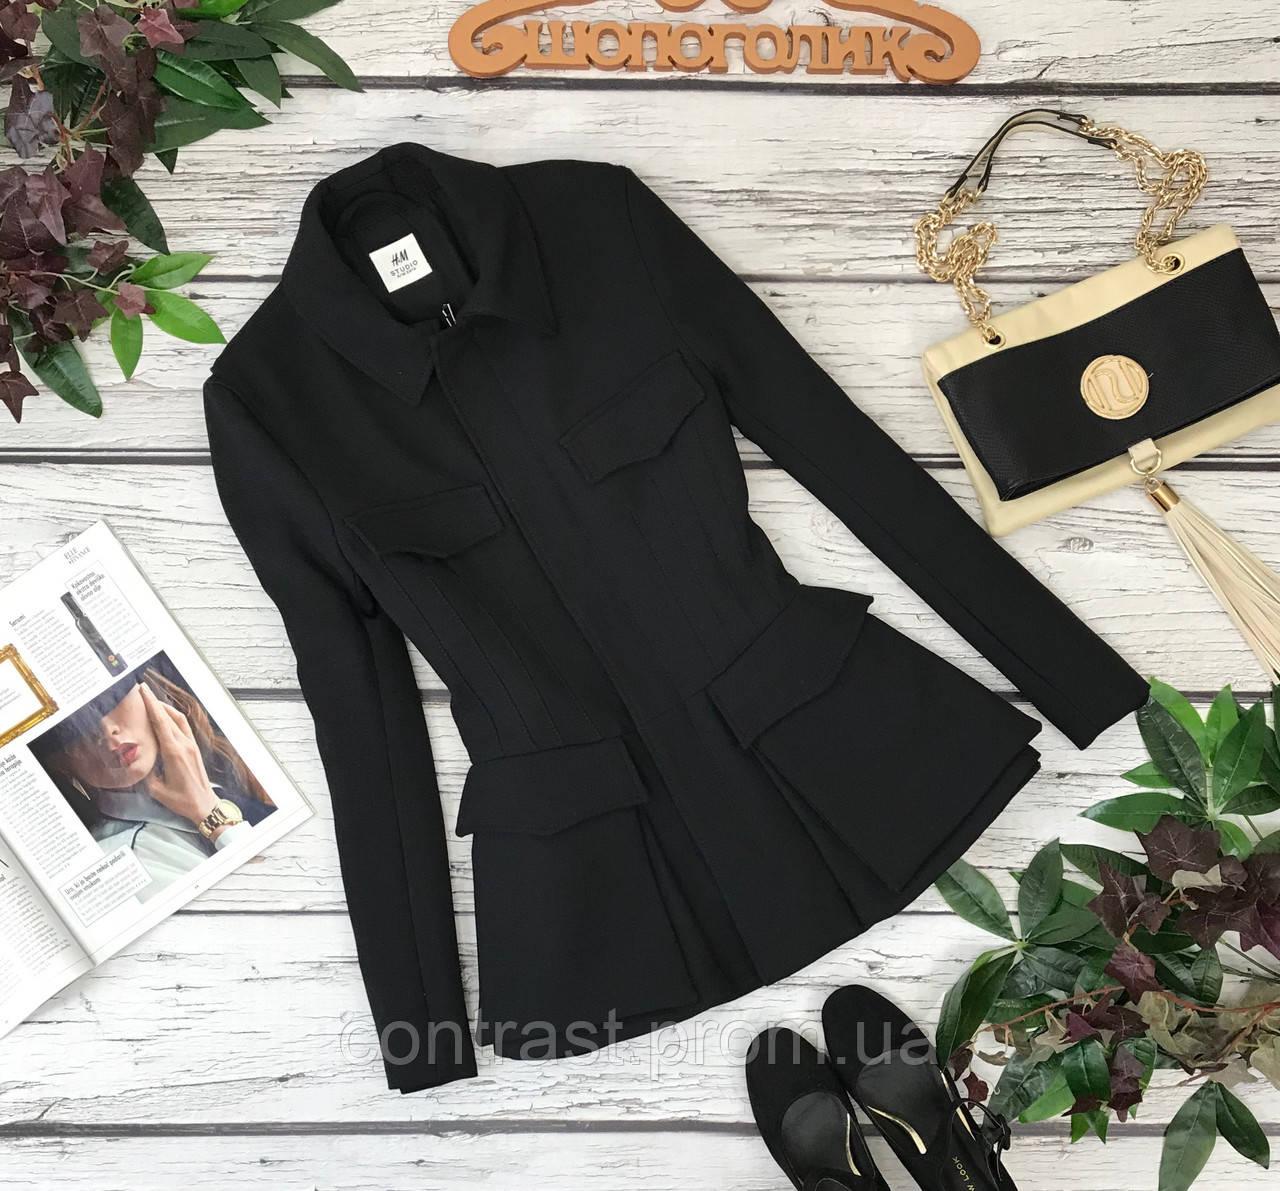 Ультрамодная куртка от бренда H&M 6/34/XXS  OV1830146